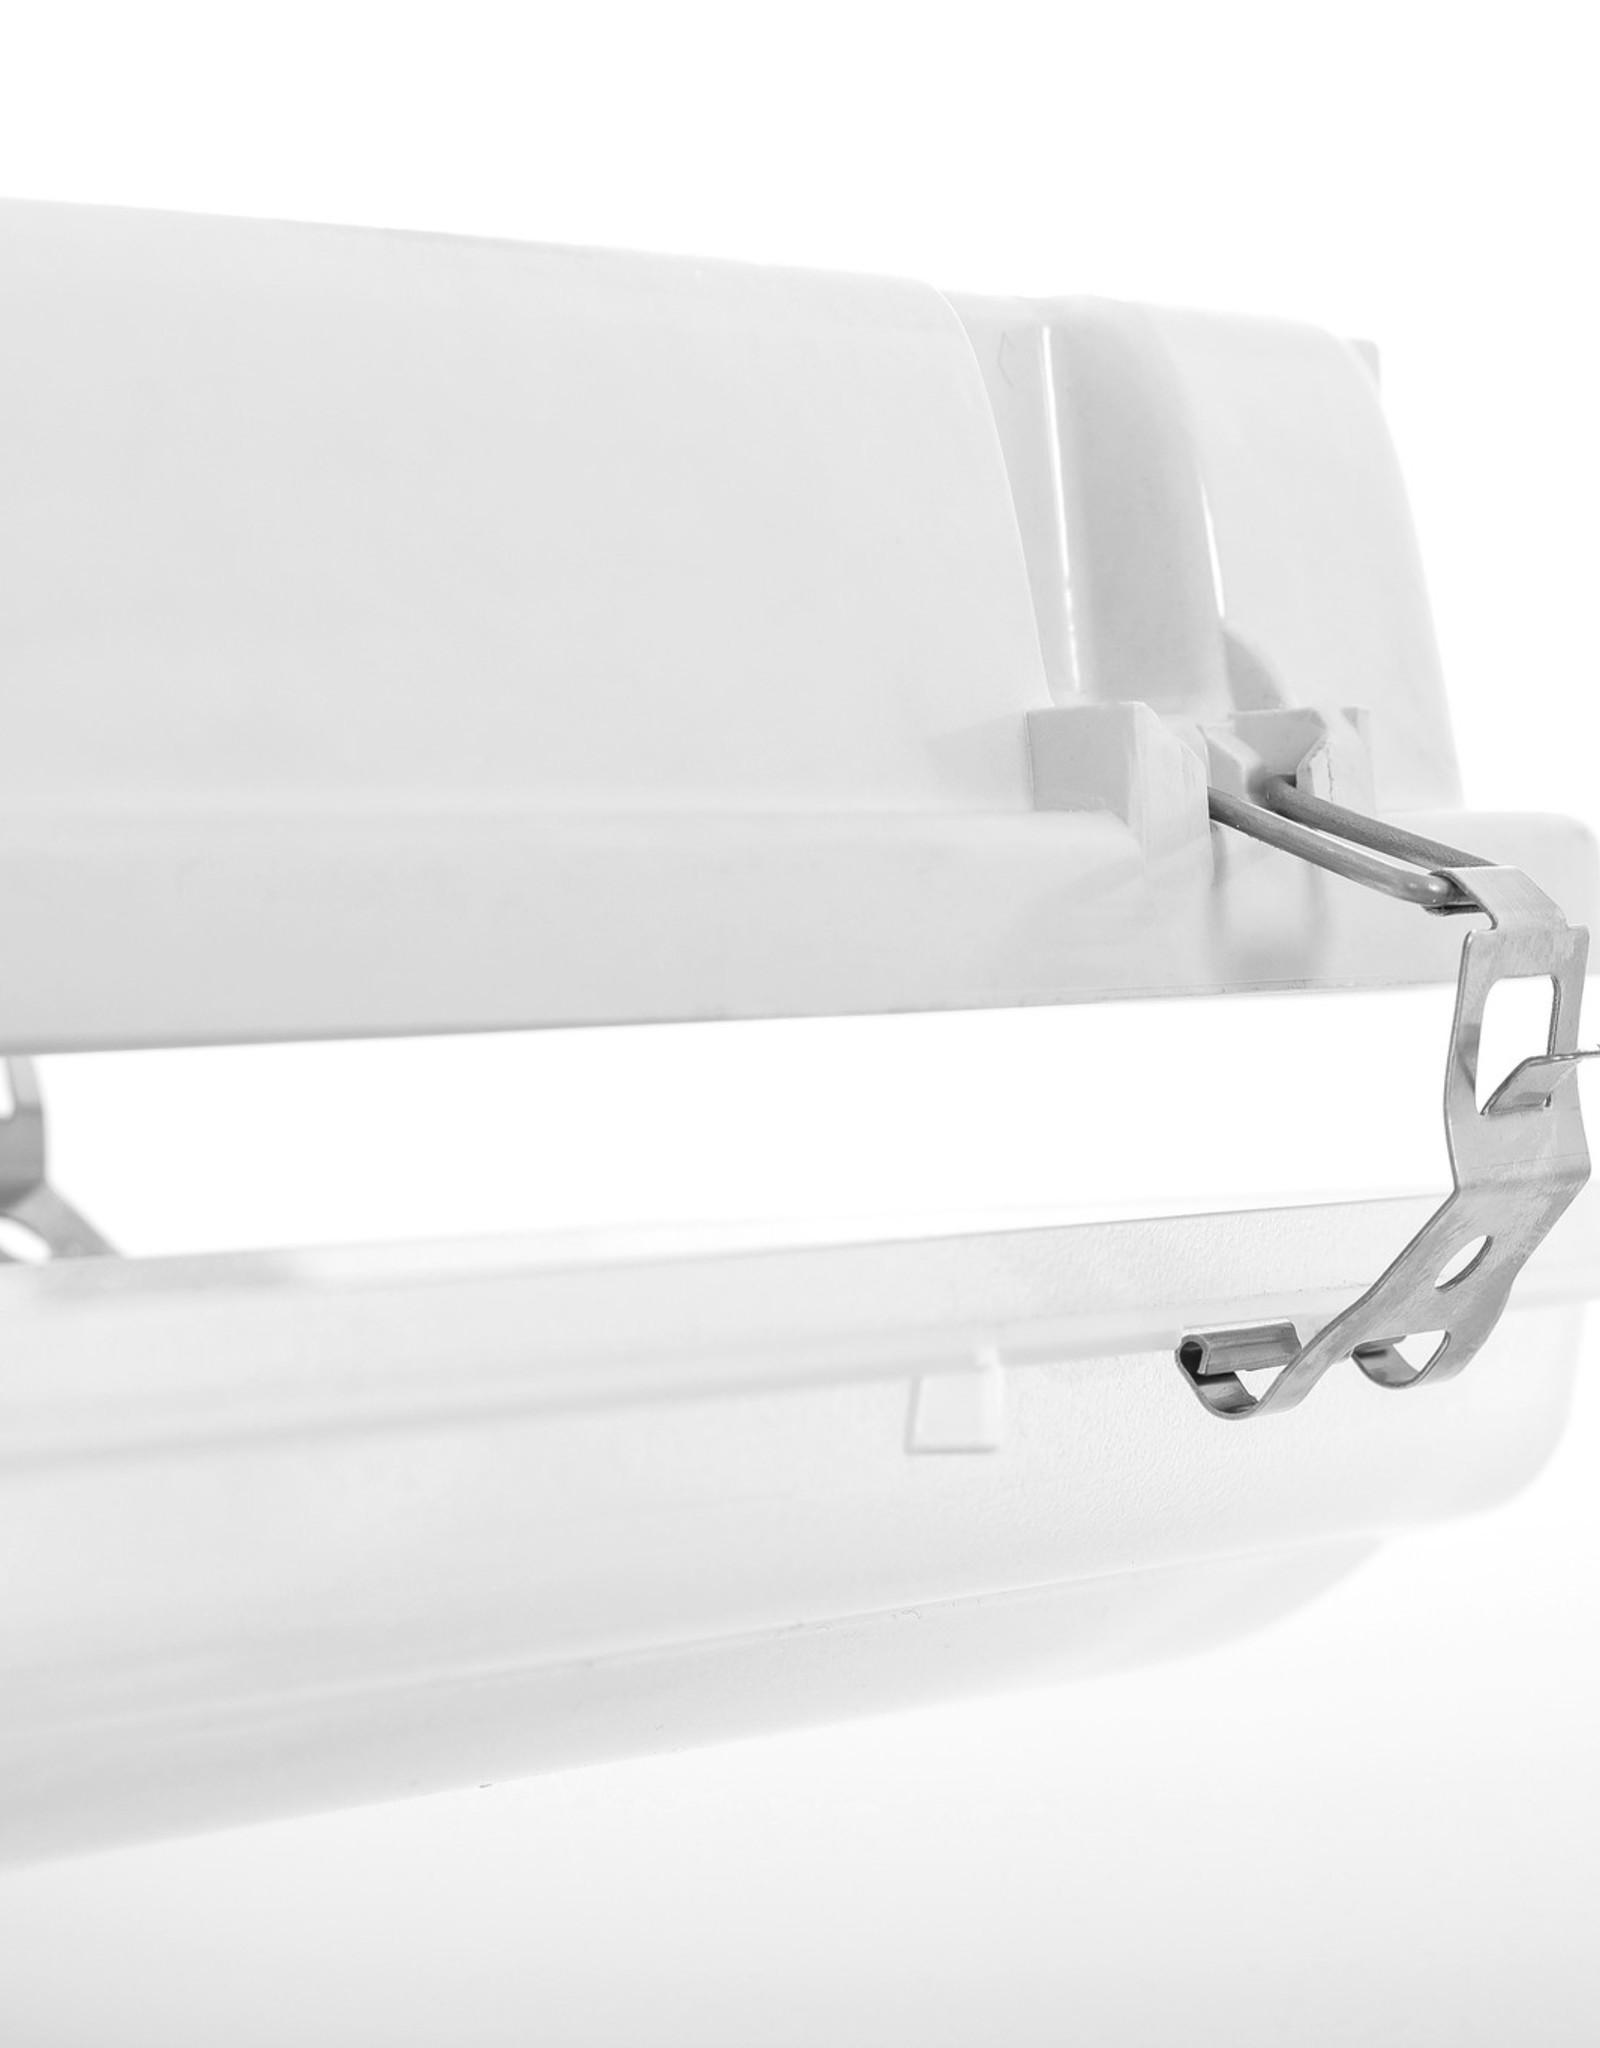 LUXON LED INDUSTRIAL: LED 5.0 BASIC Plus